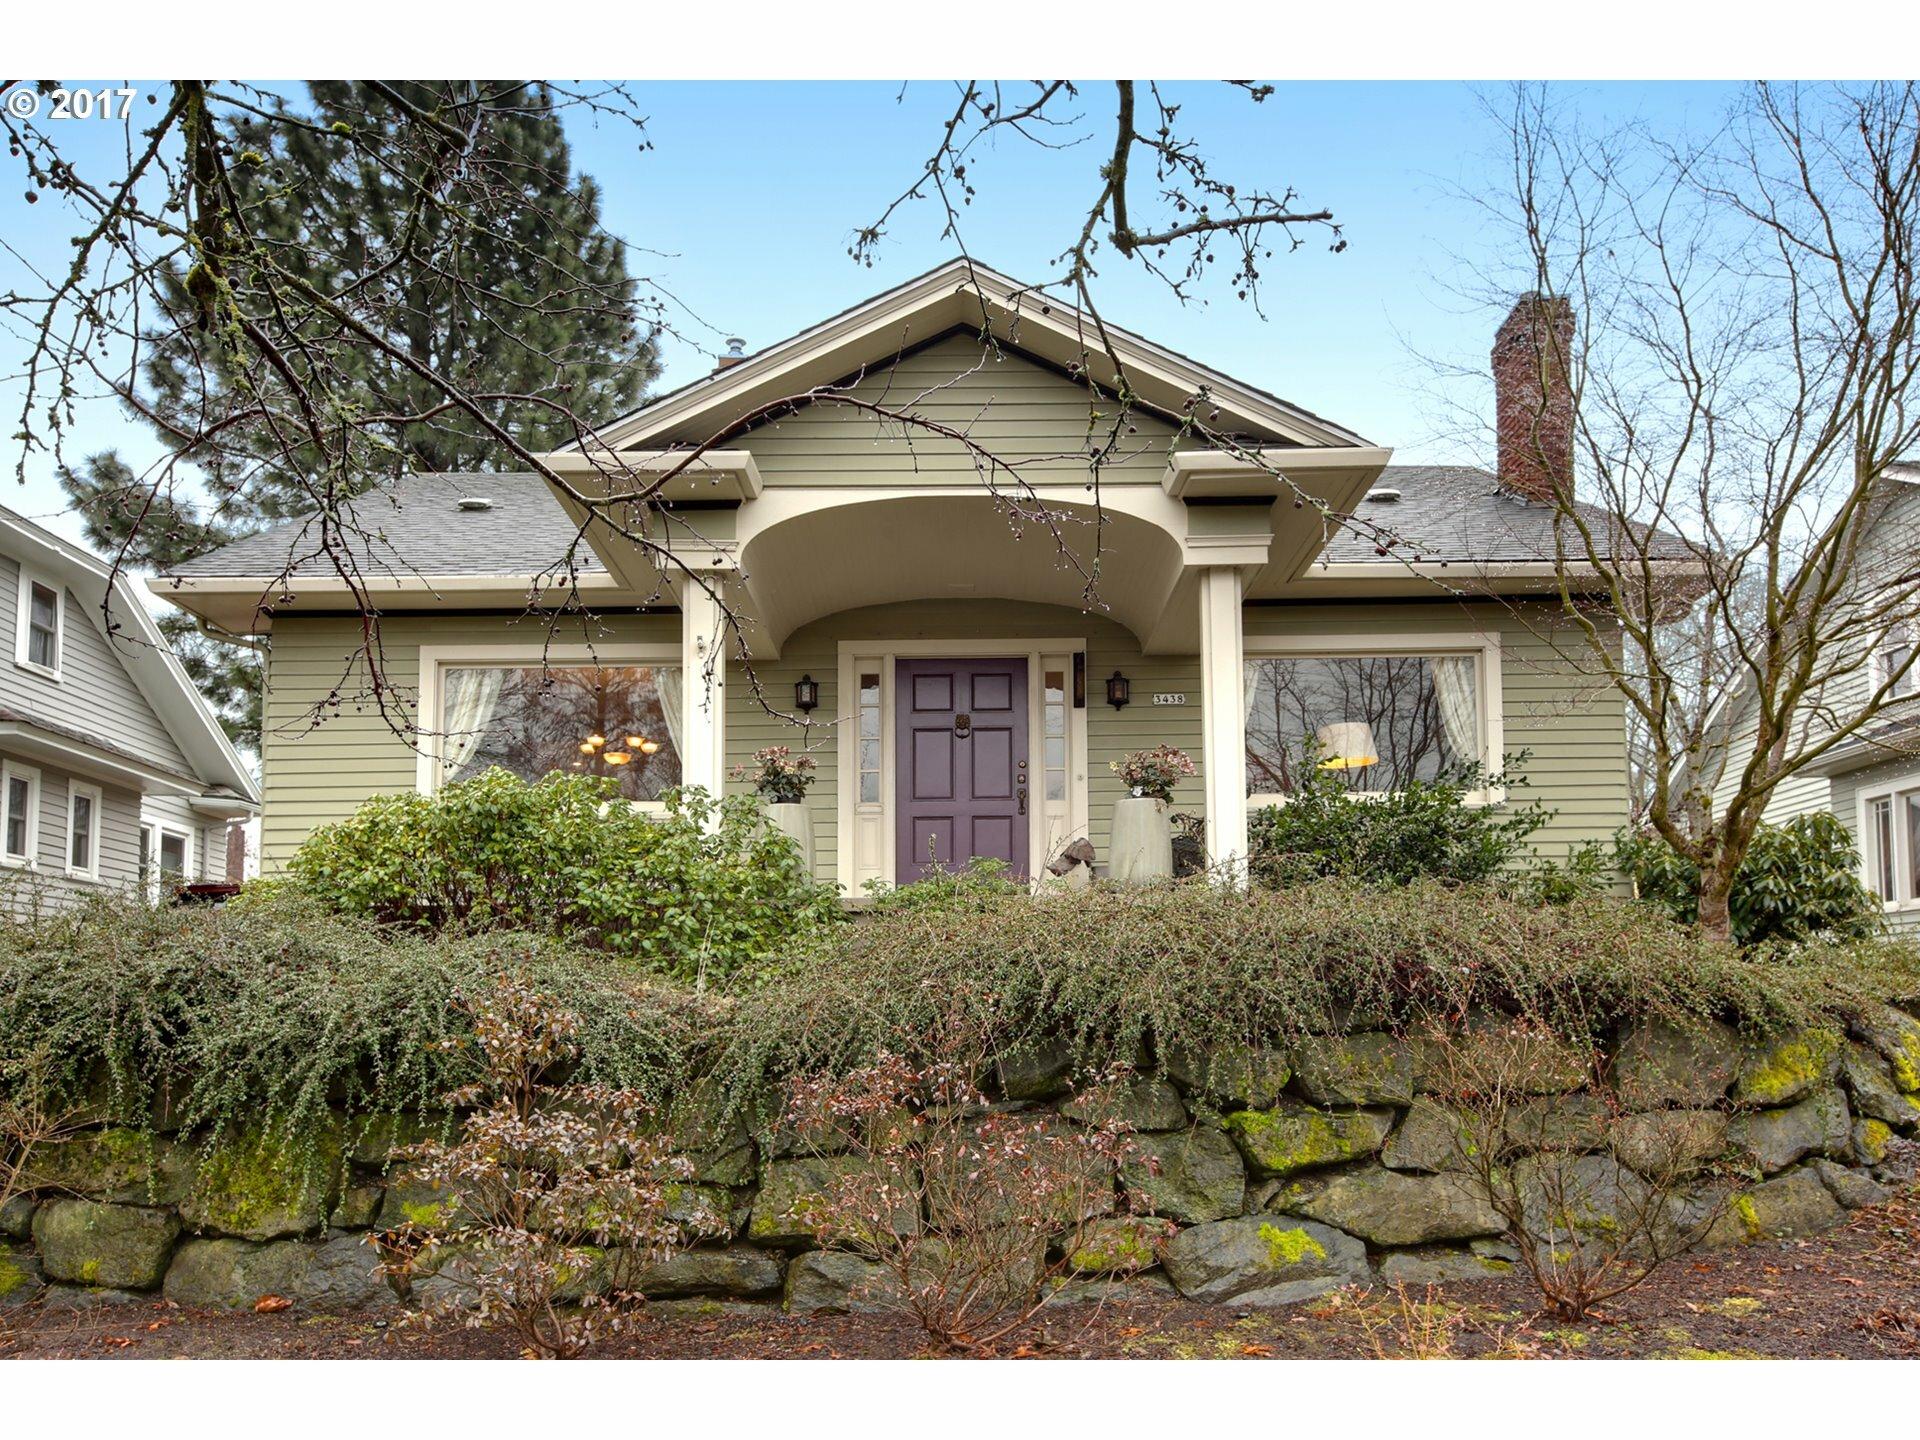 3438 Ne Hassalo St, Portland, OR - USA (photo 2)